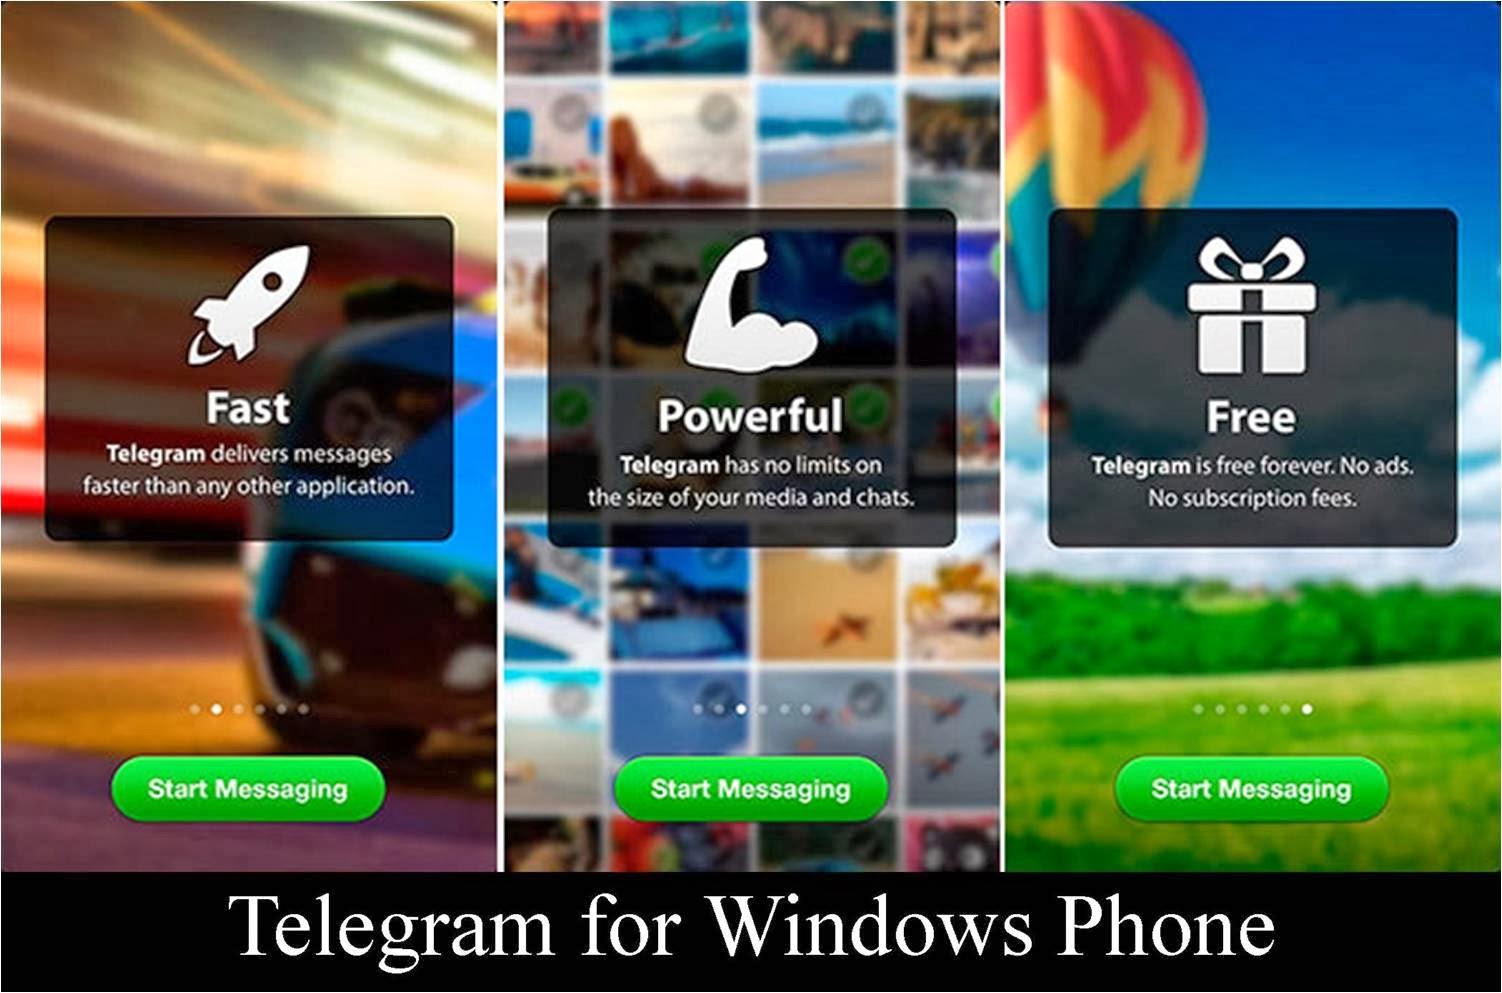 Telegram app on Windows phone